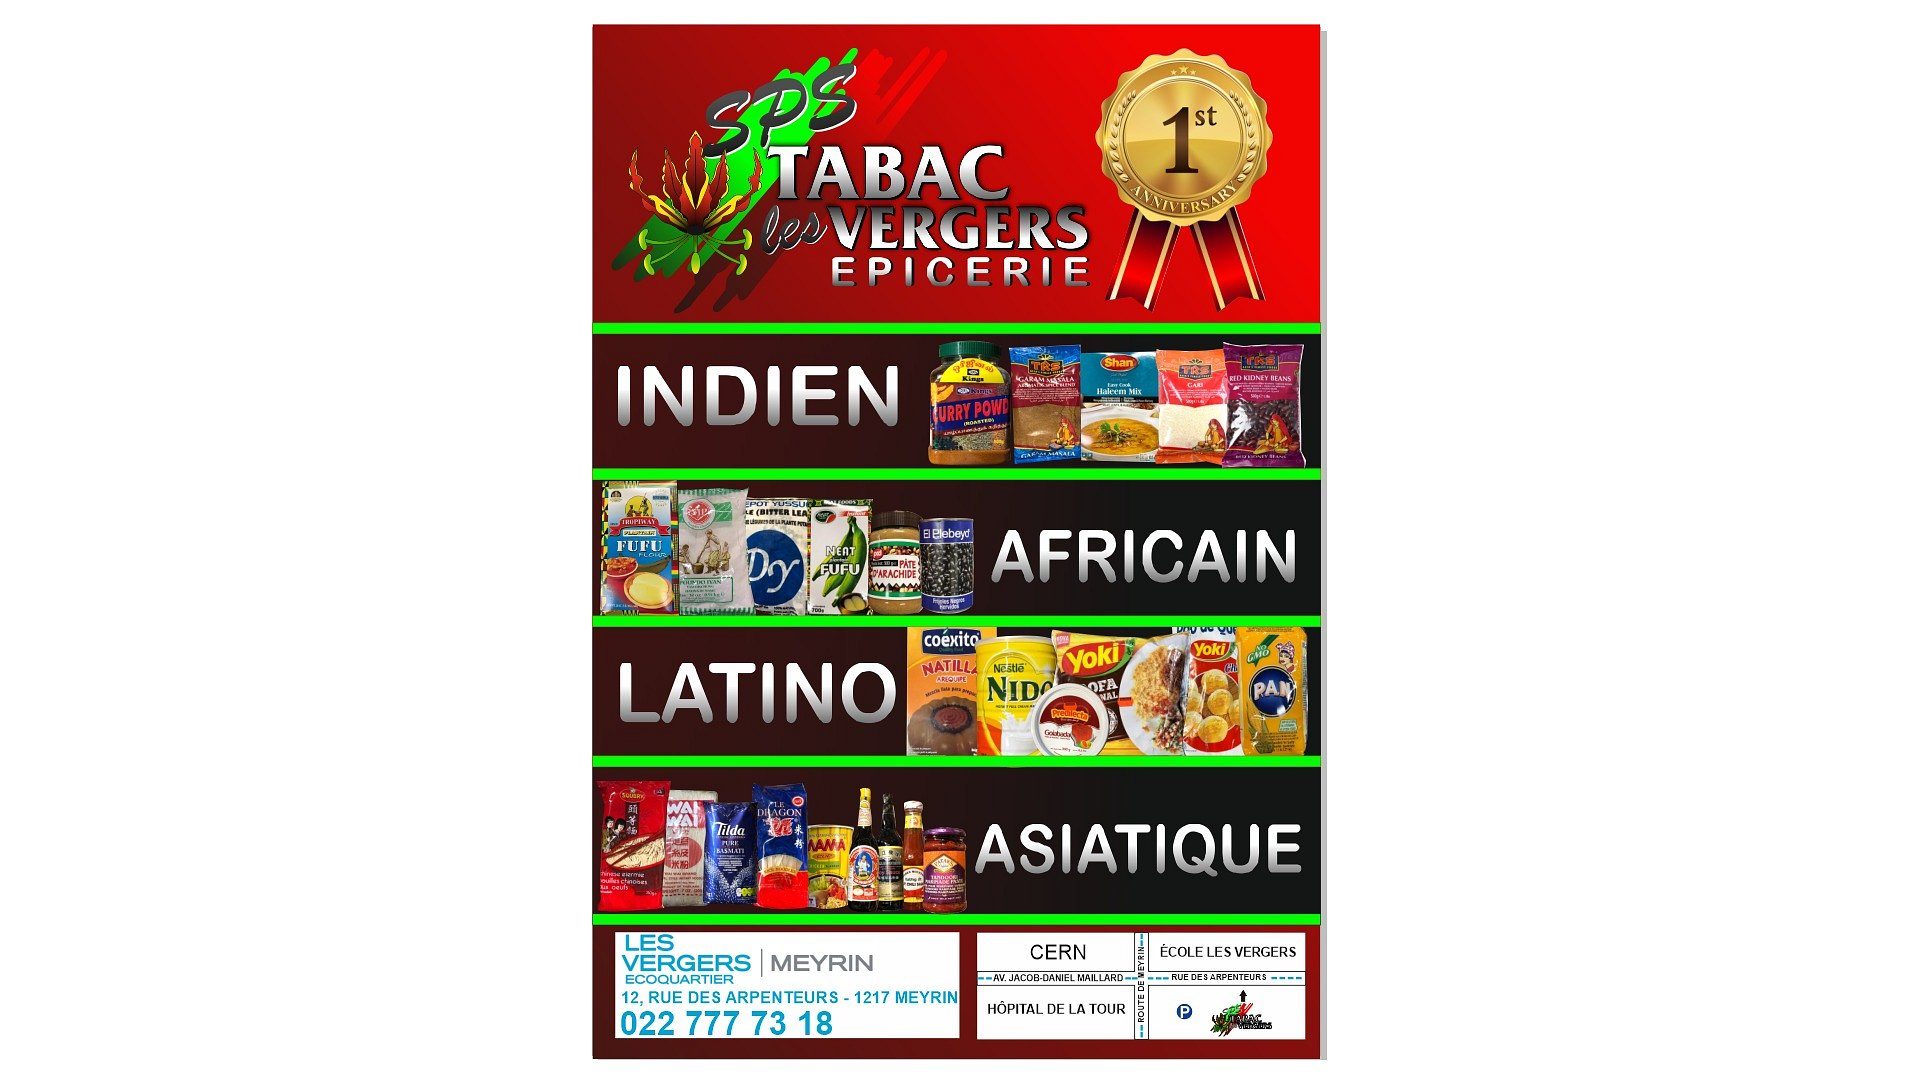 SPS - Tabac Epicerie Les Vergers